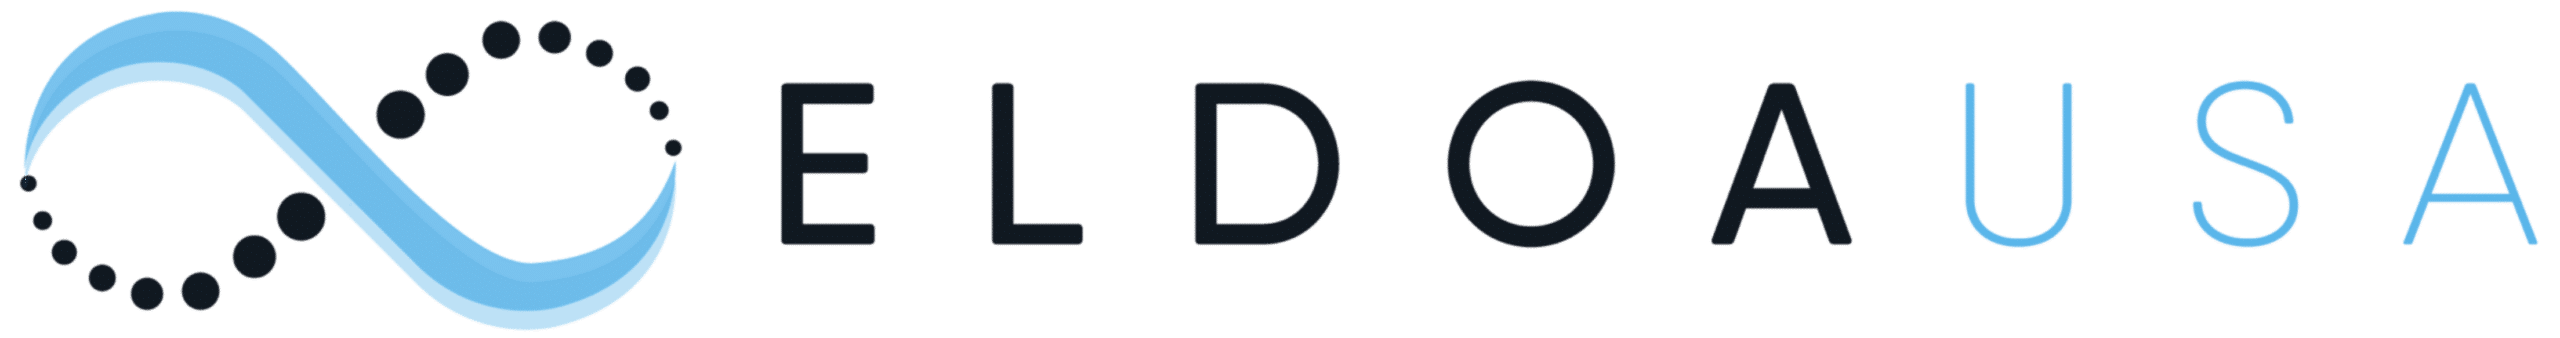 ELDOAUSA | Guy VOYER DO's Education Programs